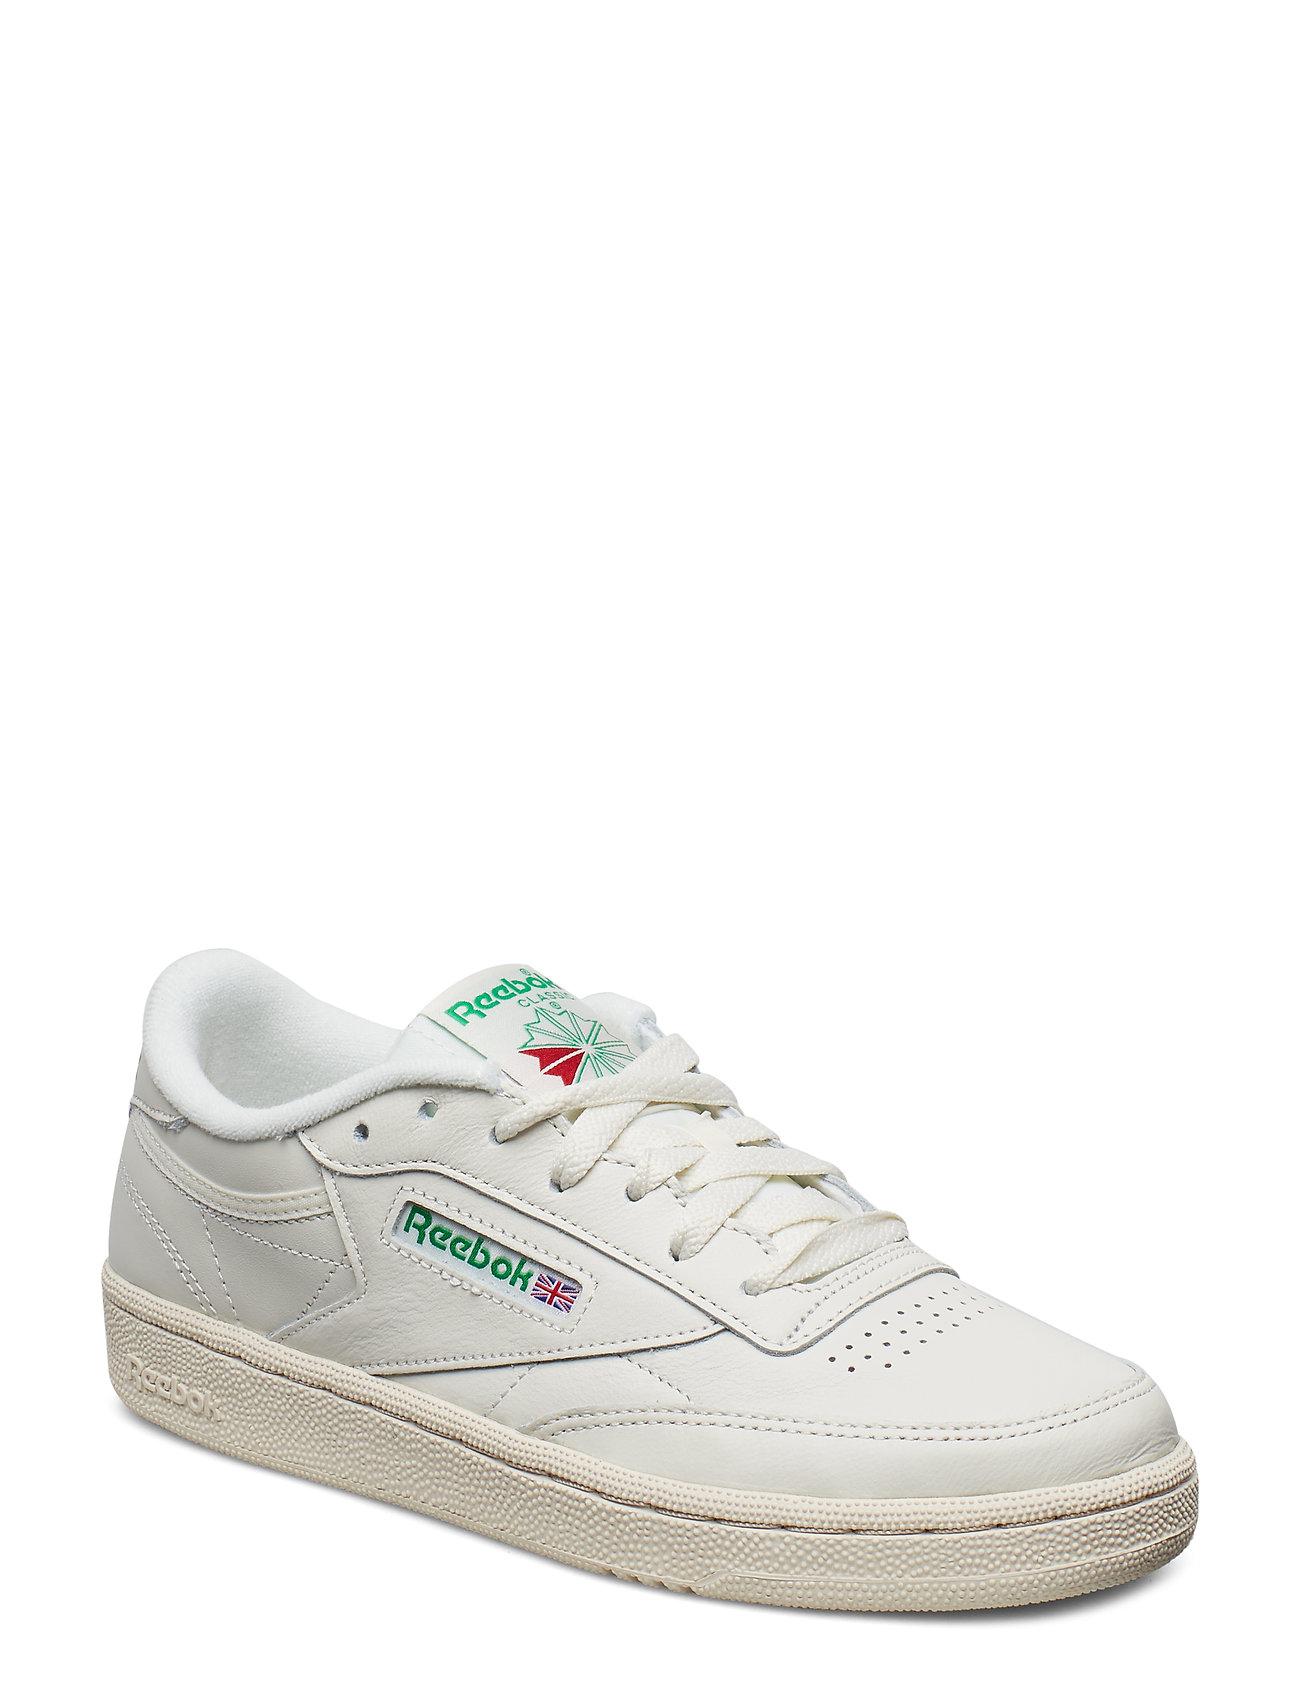 Club C 85 Low-top Sneakers Creme Reebok Classics